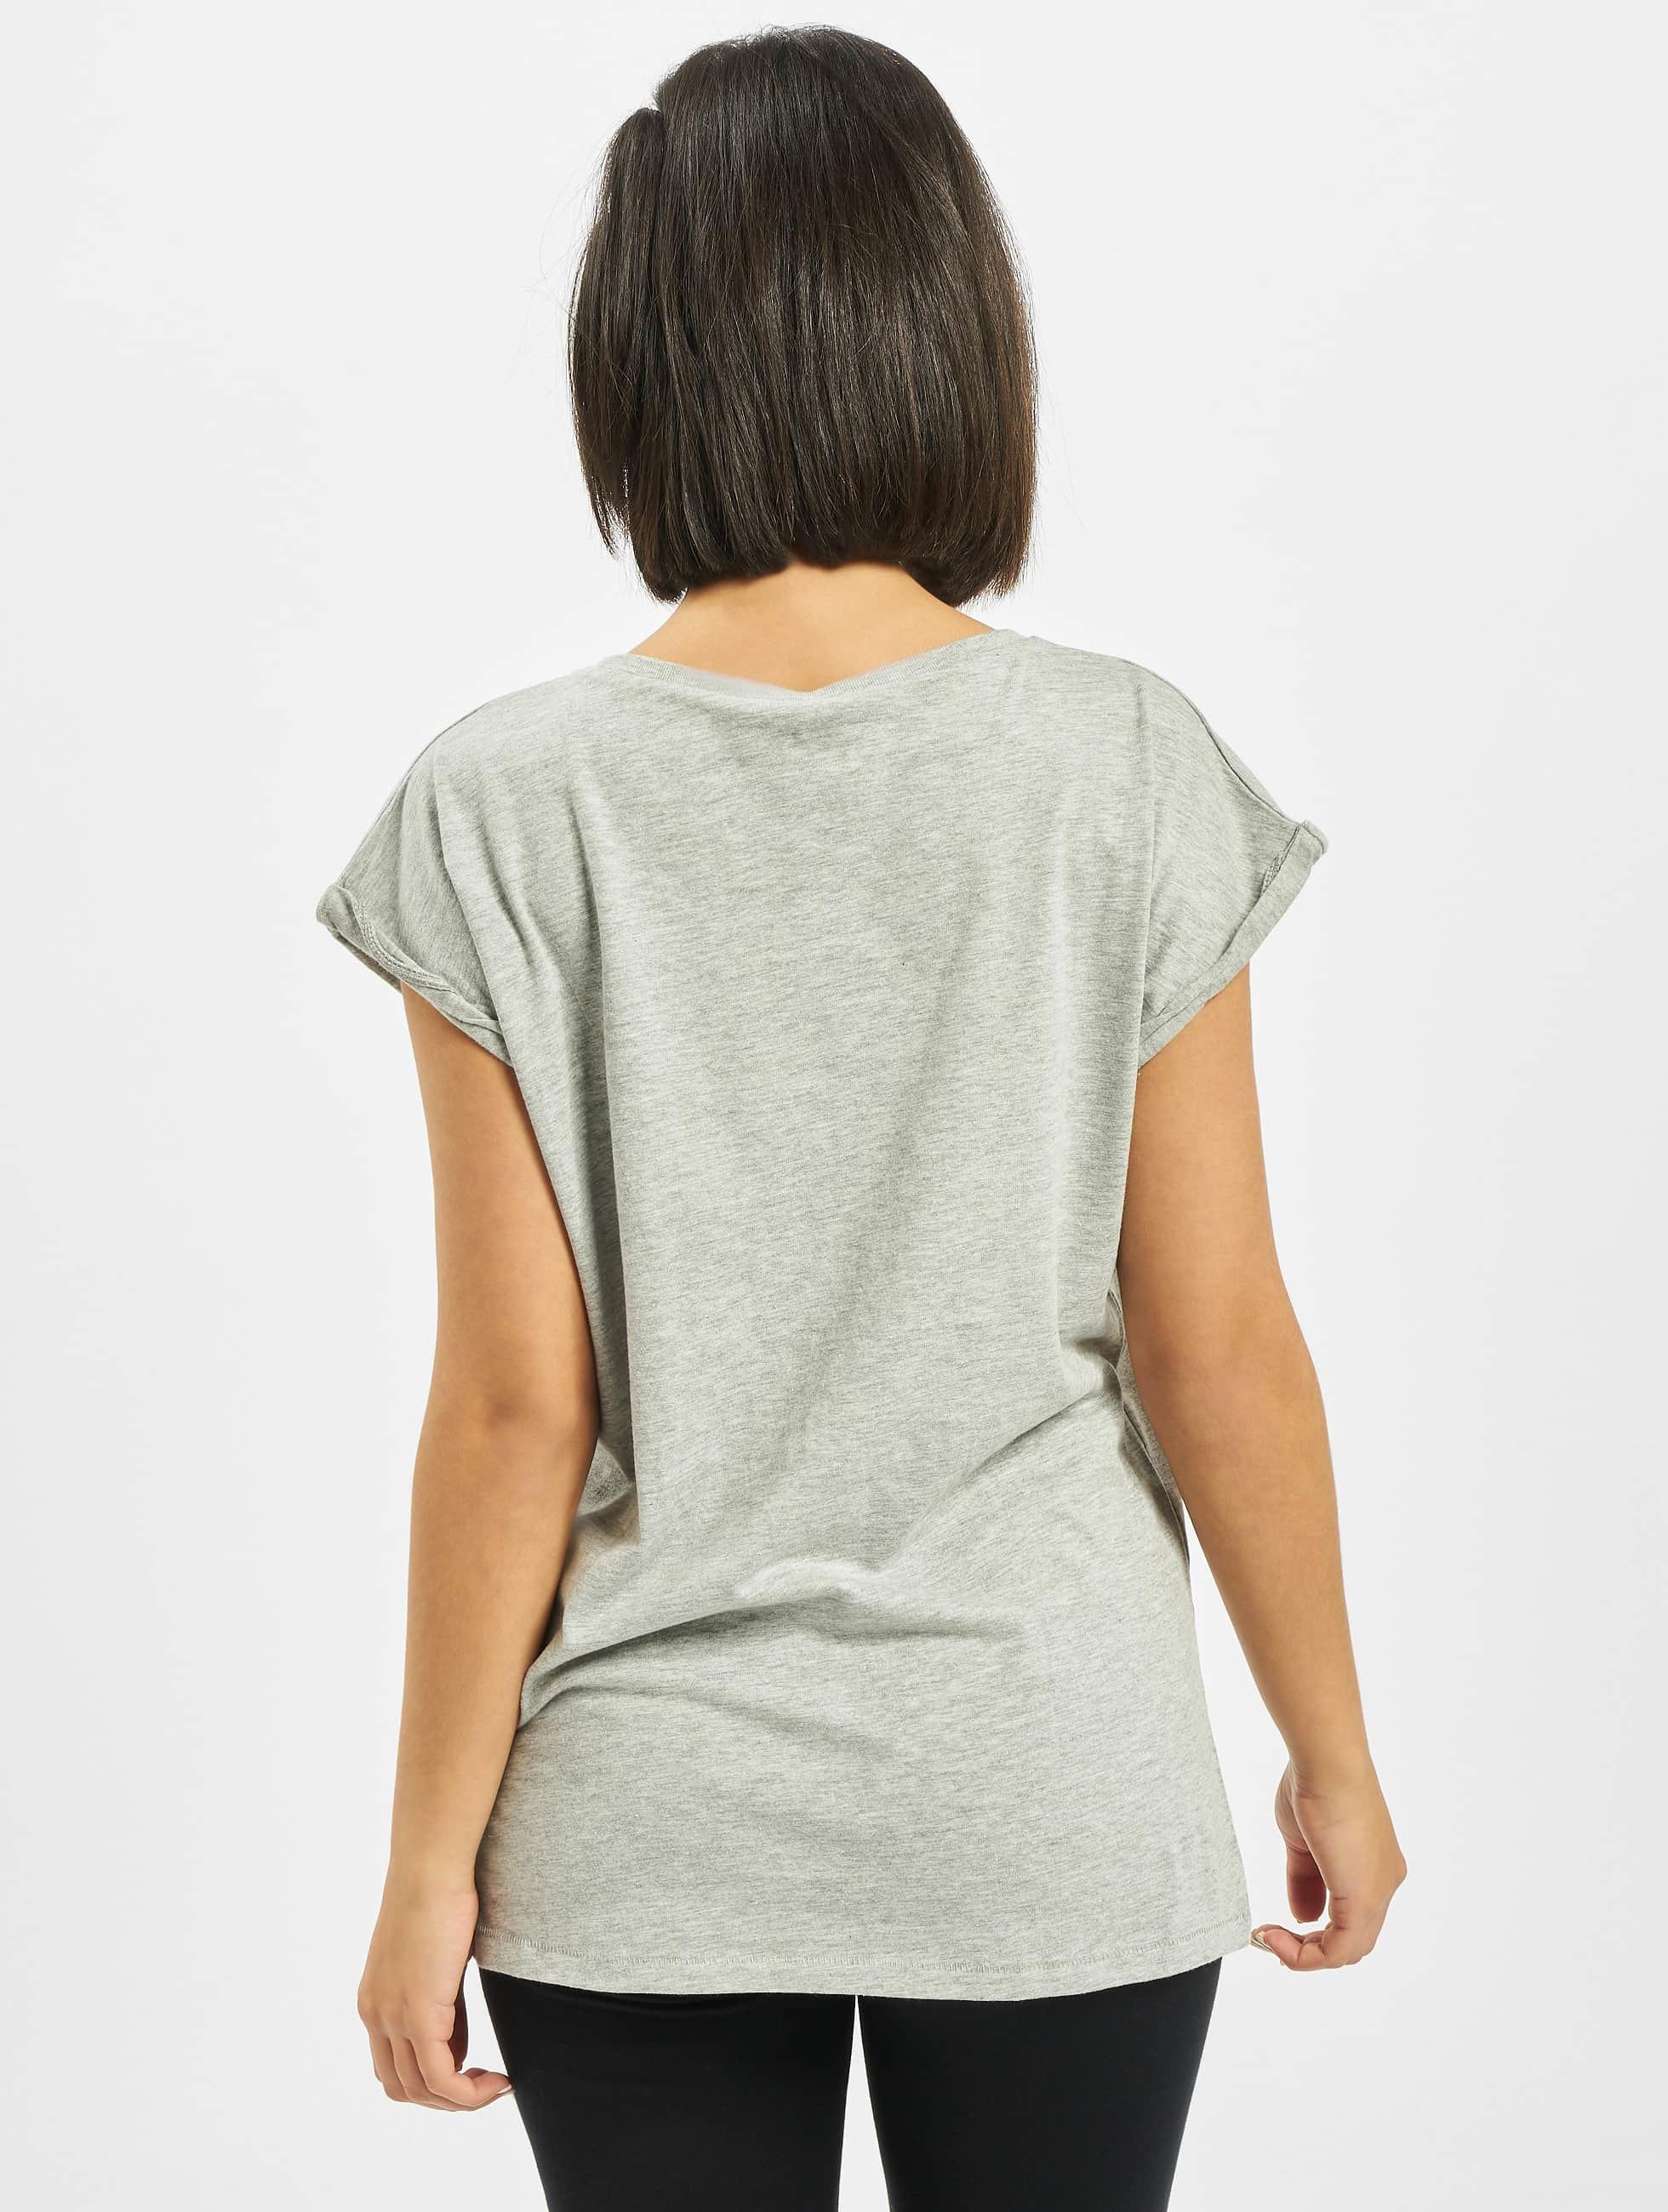 Mister Tee T-Shirt Ladies Five Seconds Of Summer Longprint grau